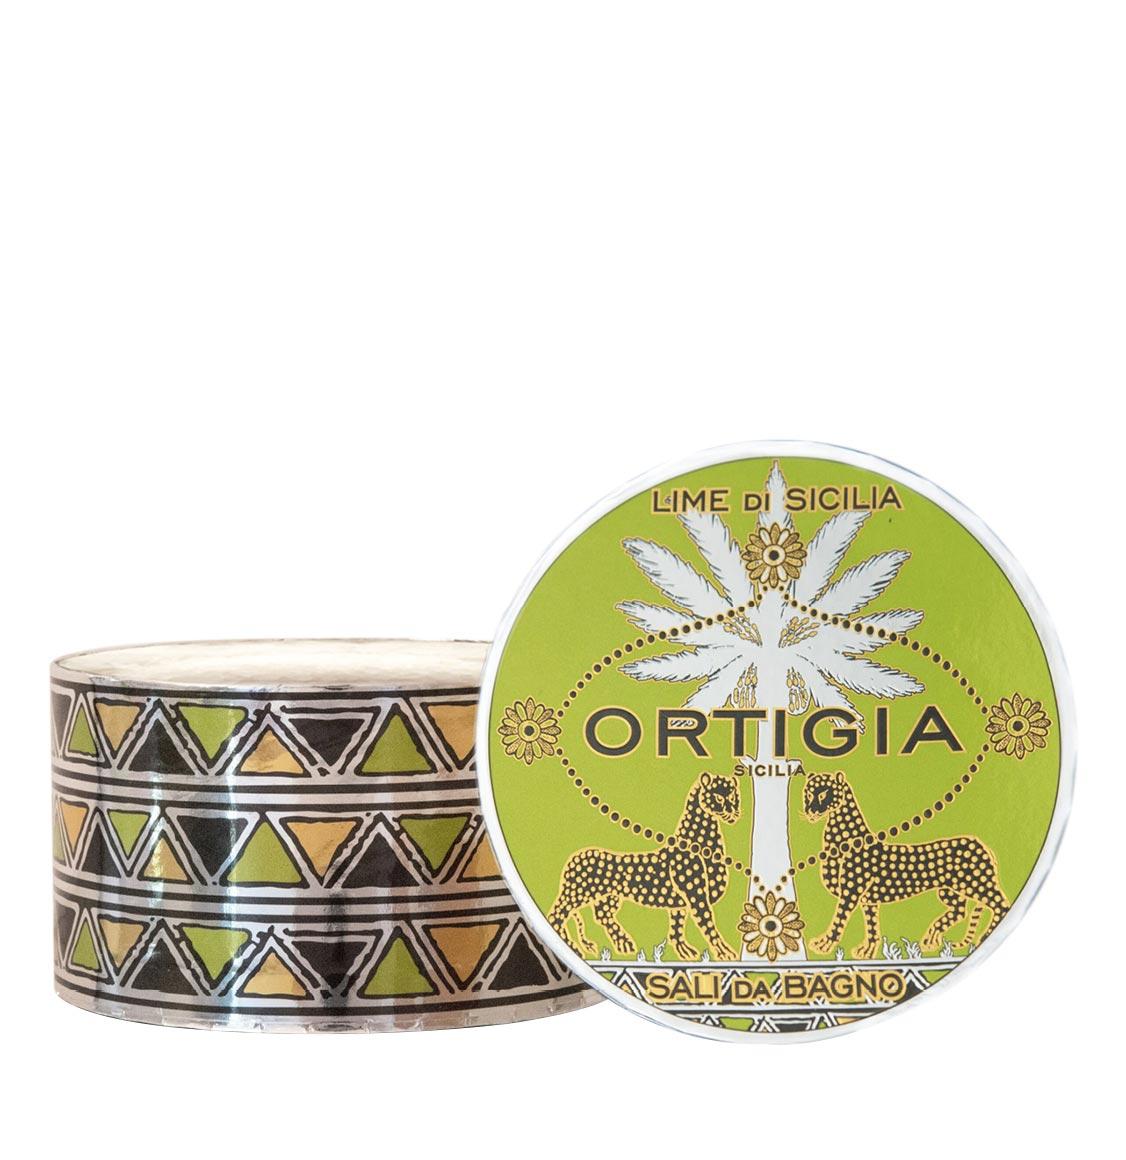 Ortigia Sicilia Lime Bath Salts 500g